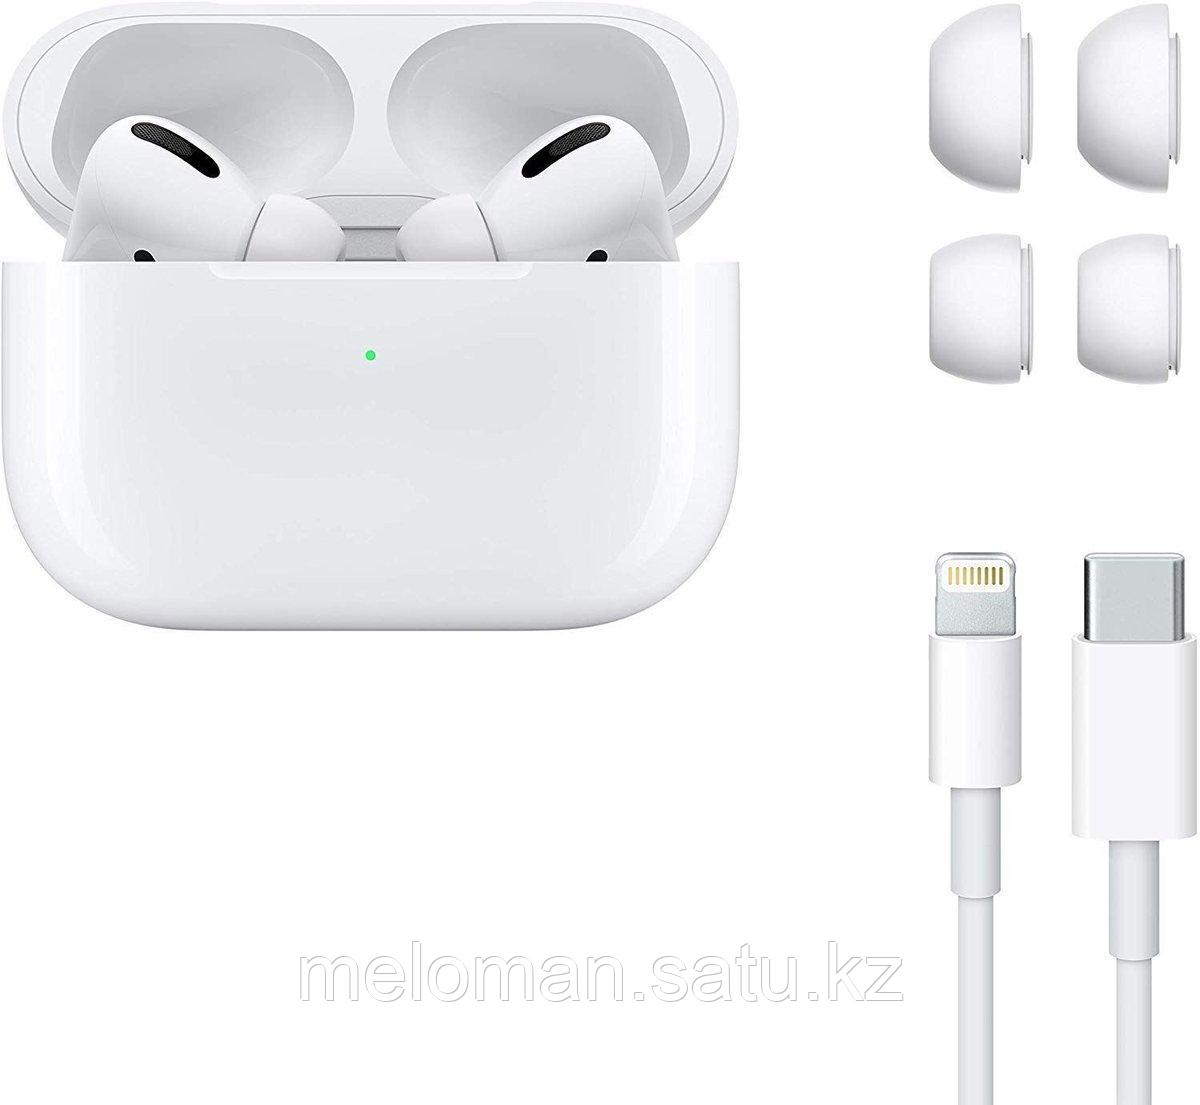 Беспроводные наушники Apple AirPods PRO wireless charging case - фото 6